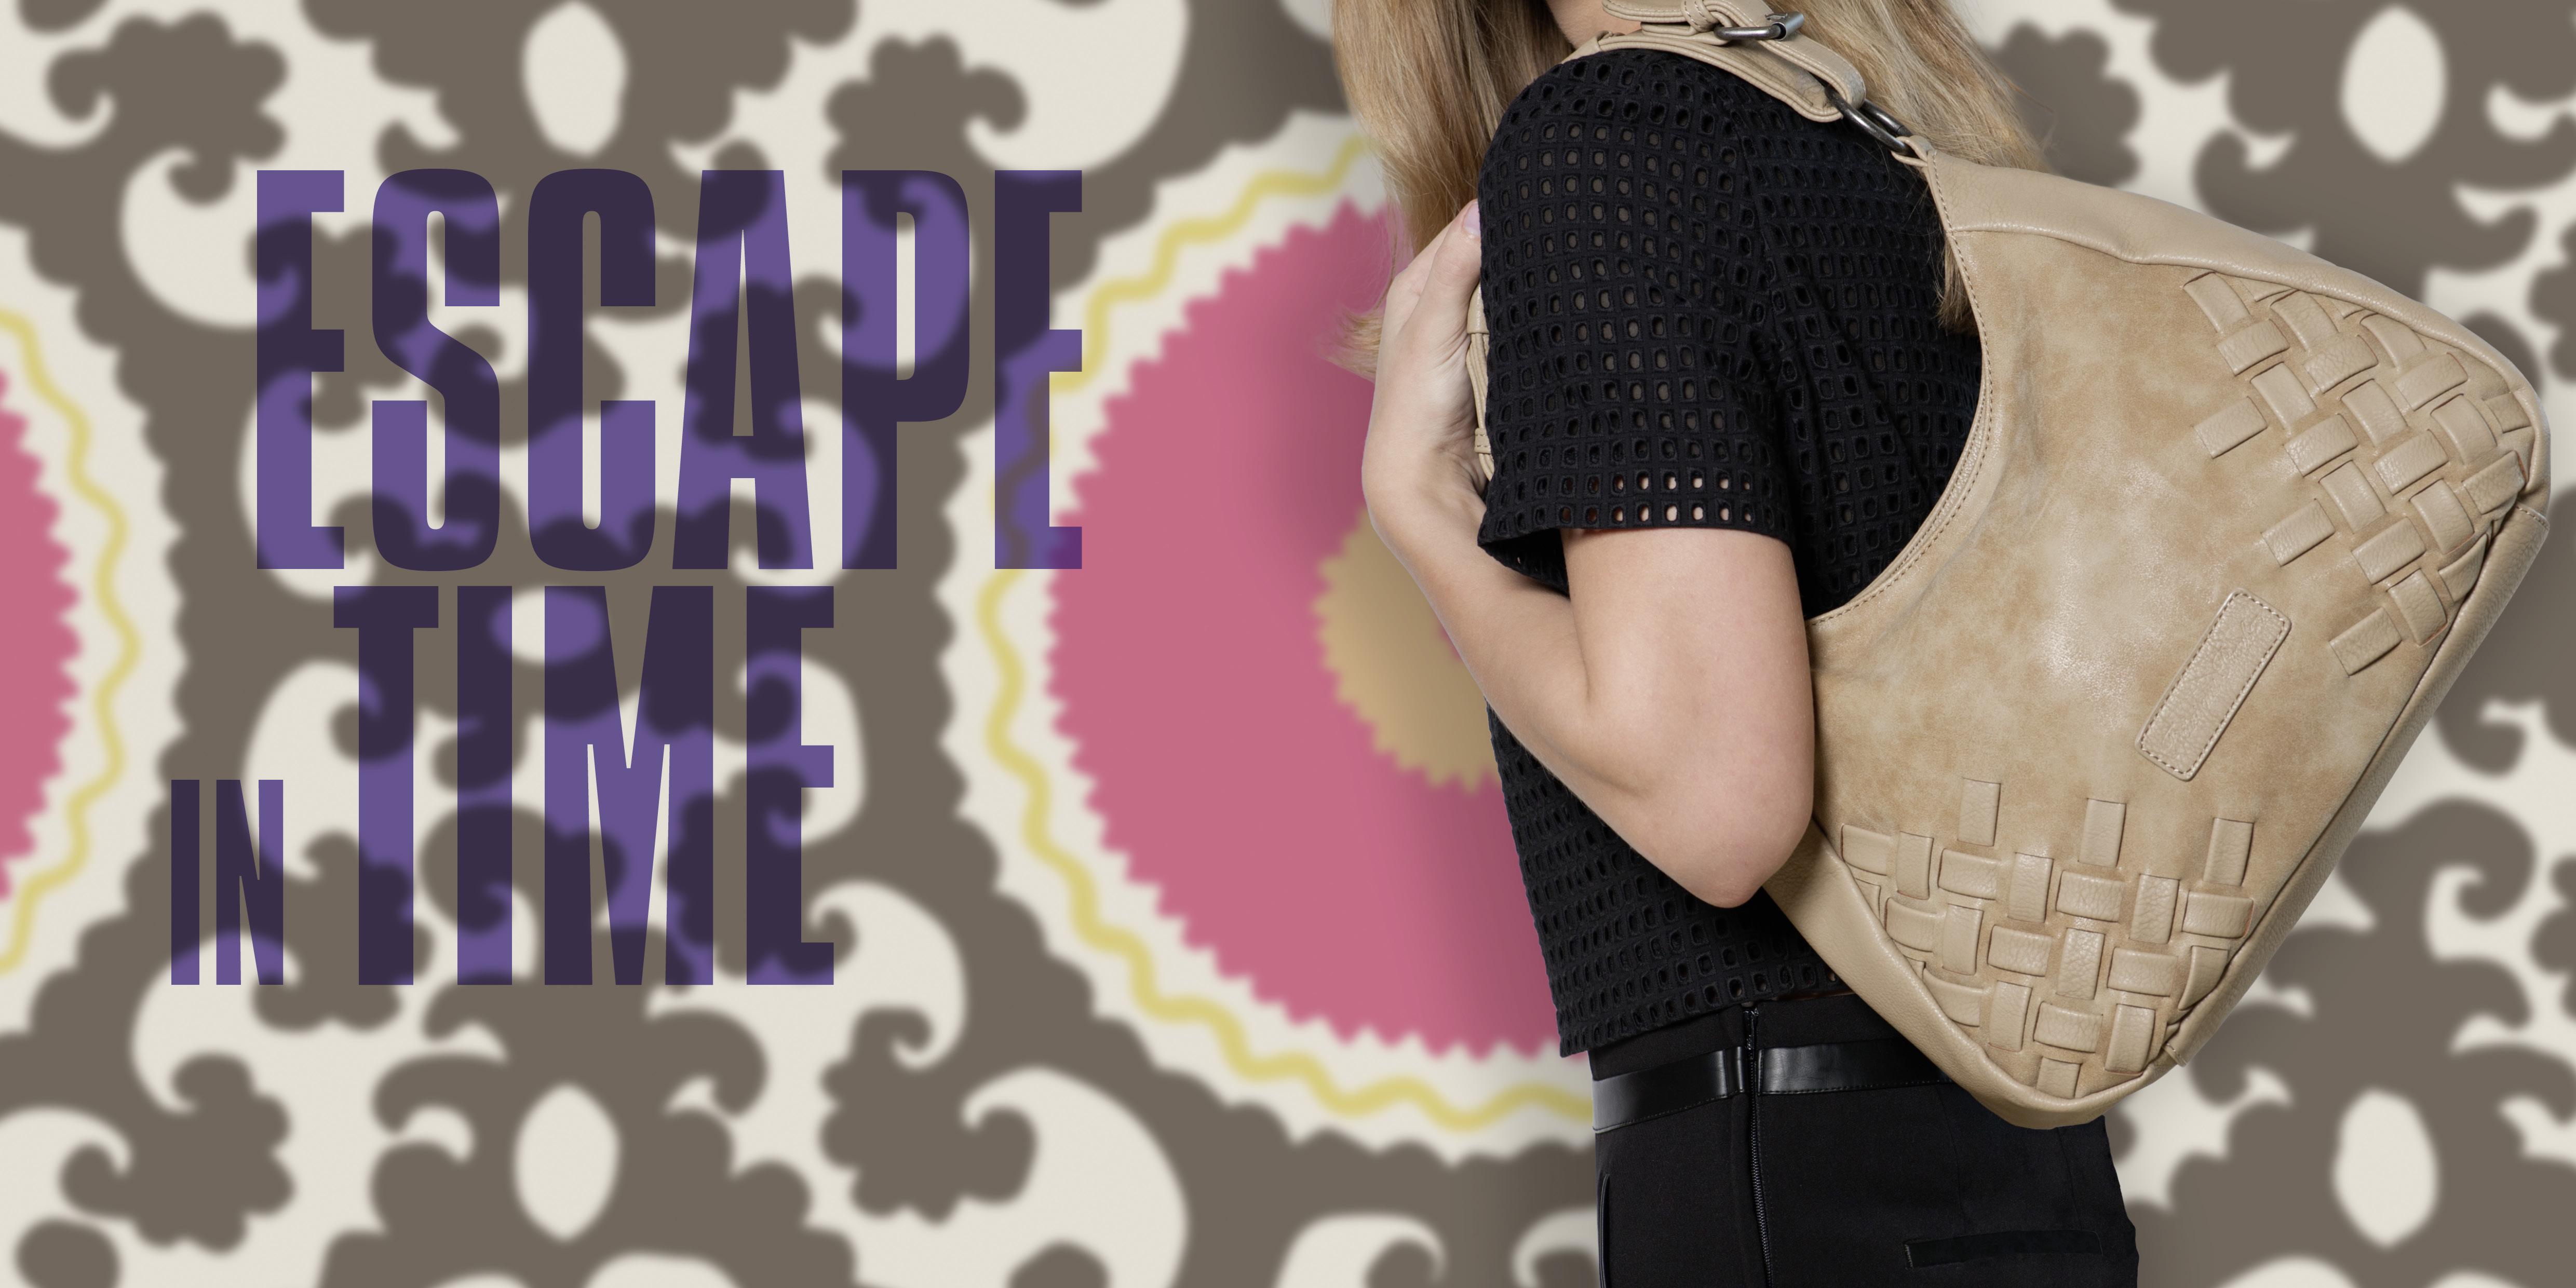 fritzi aus preu en damen handtaschen f r alle frauen unter uns die. Black Bedroom Furniture Sets. Home Design Ideas